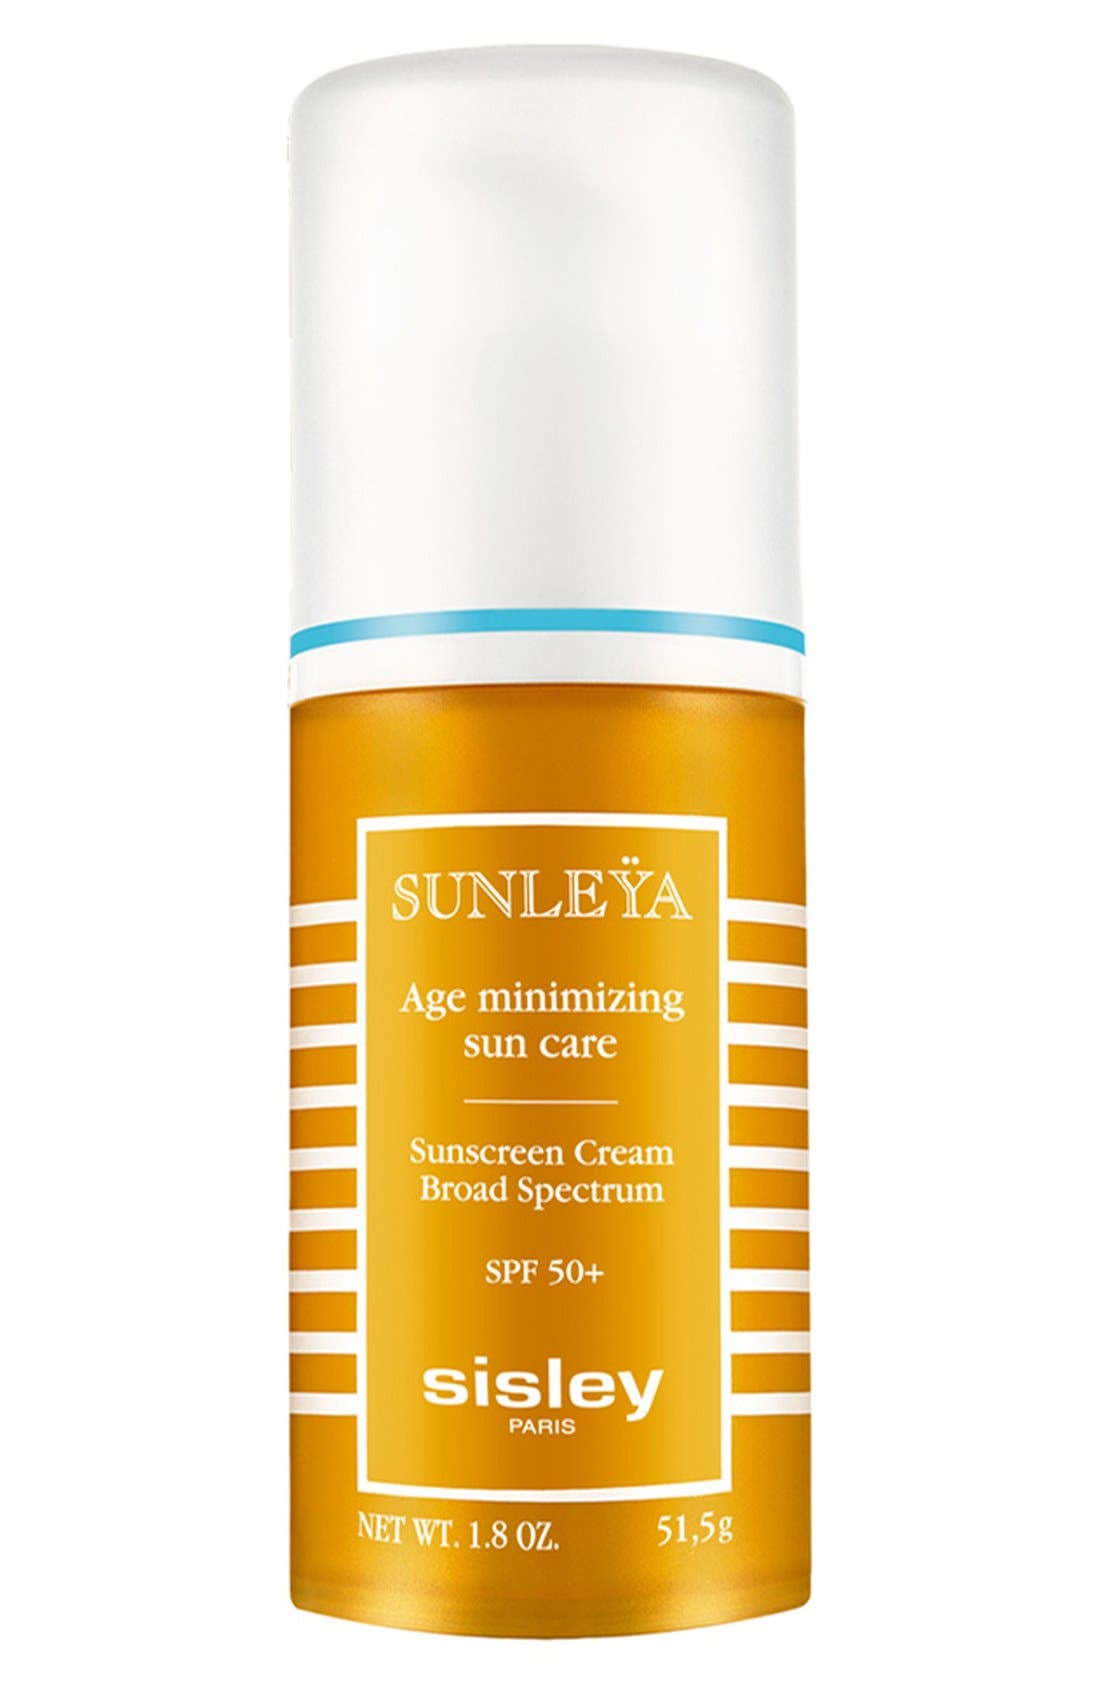 Sisley Paris 'Sunleÿa' Age Minimizer Sun Care SPF 50+